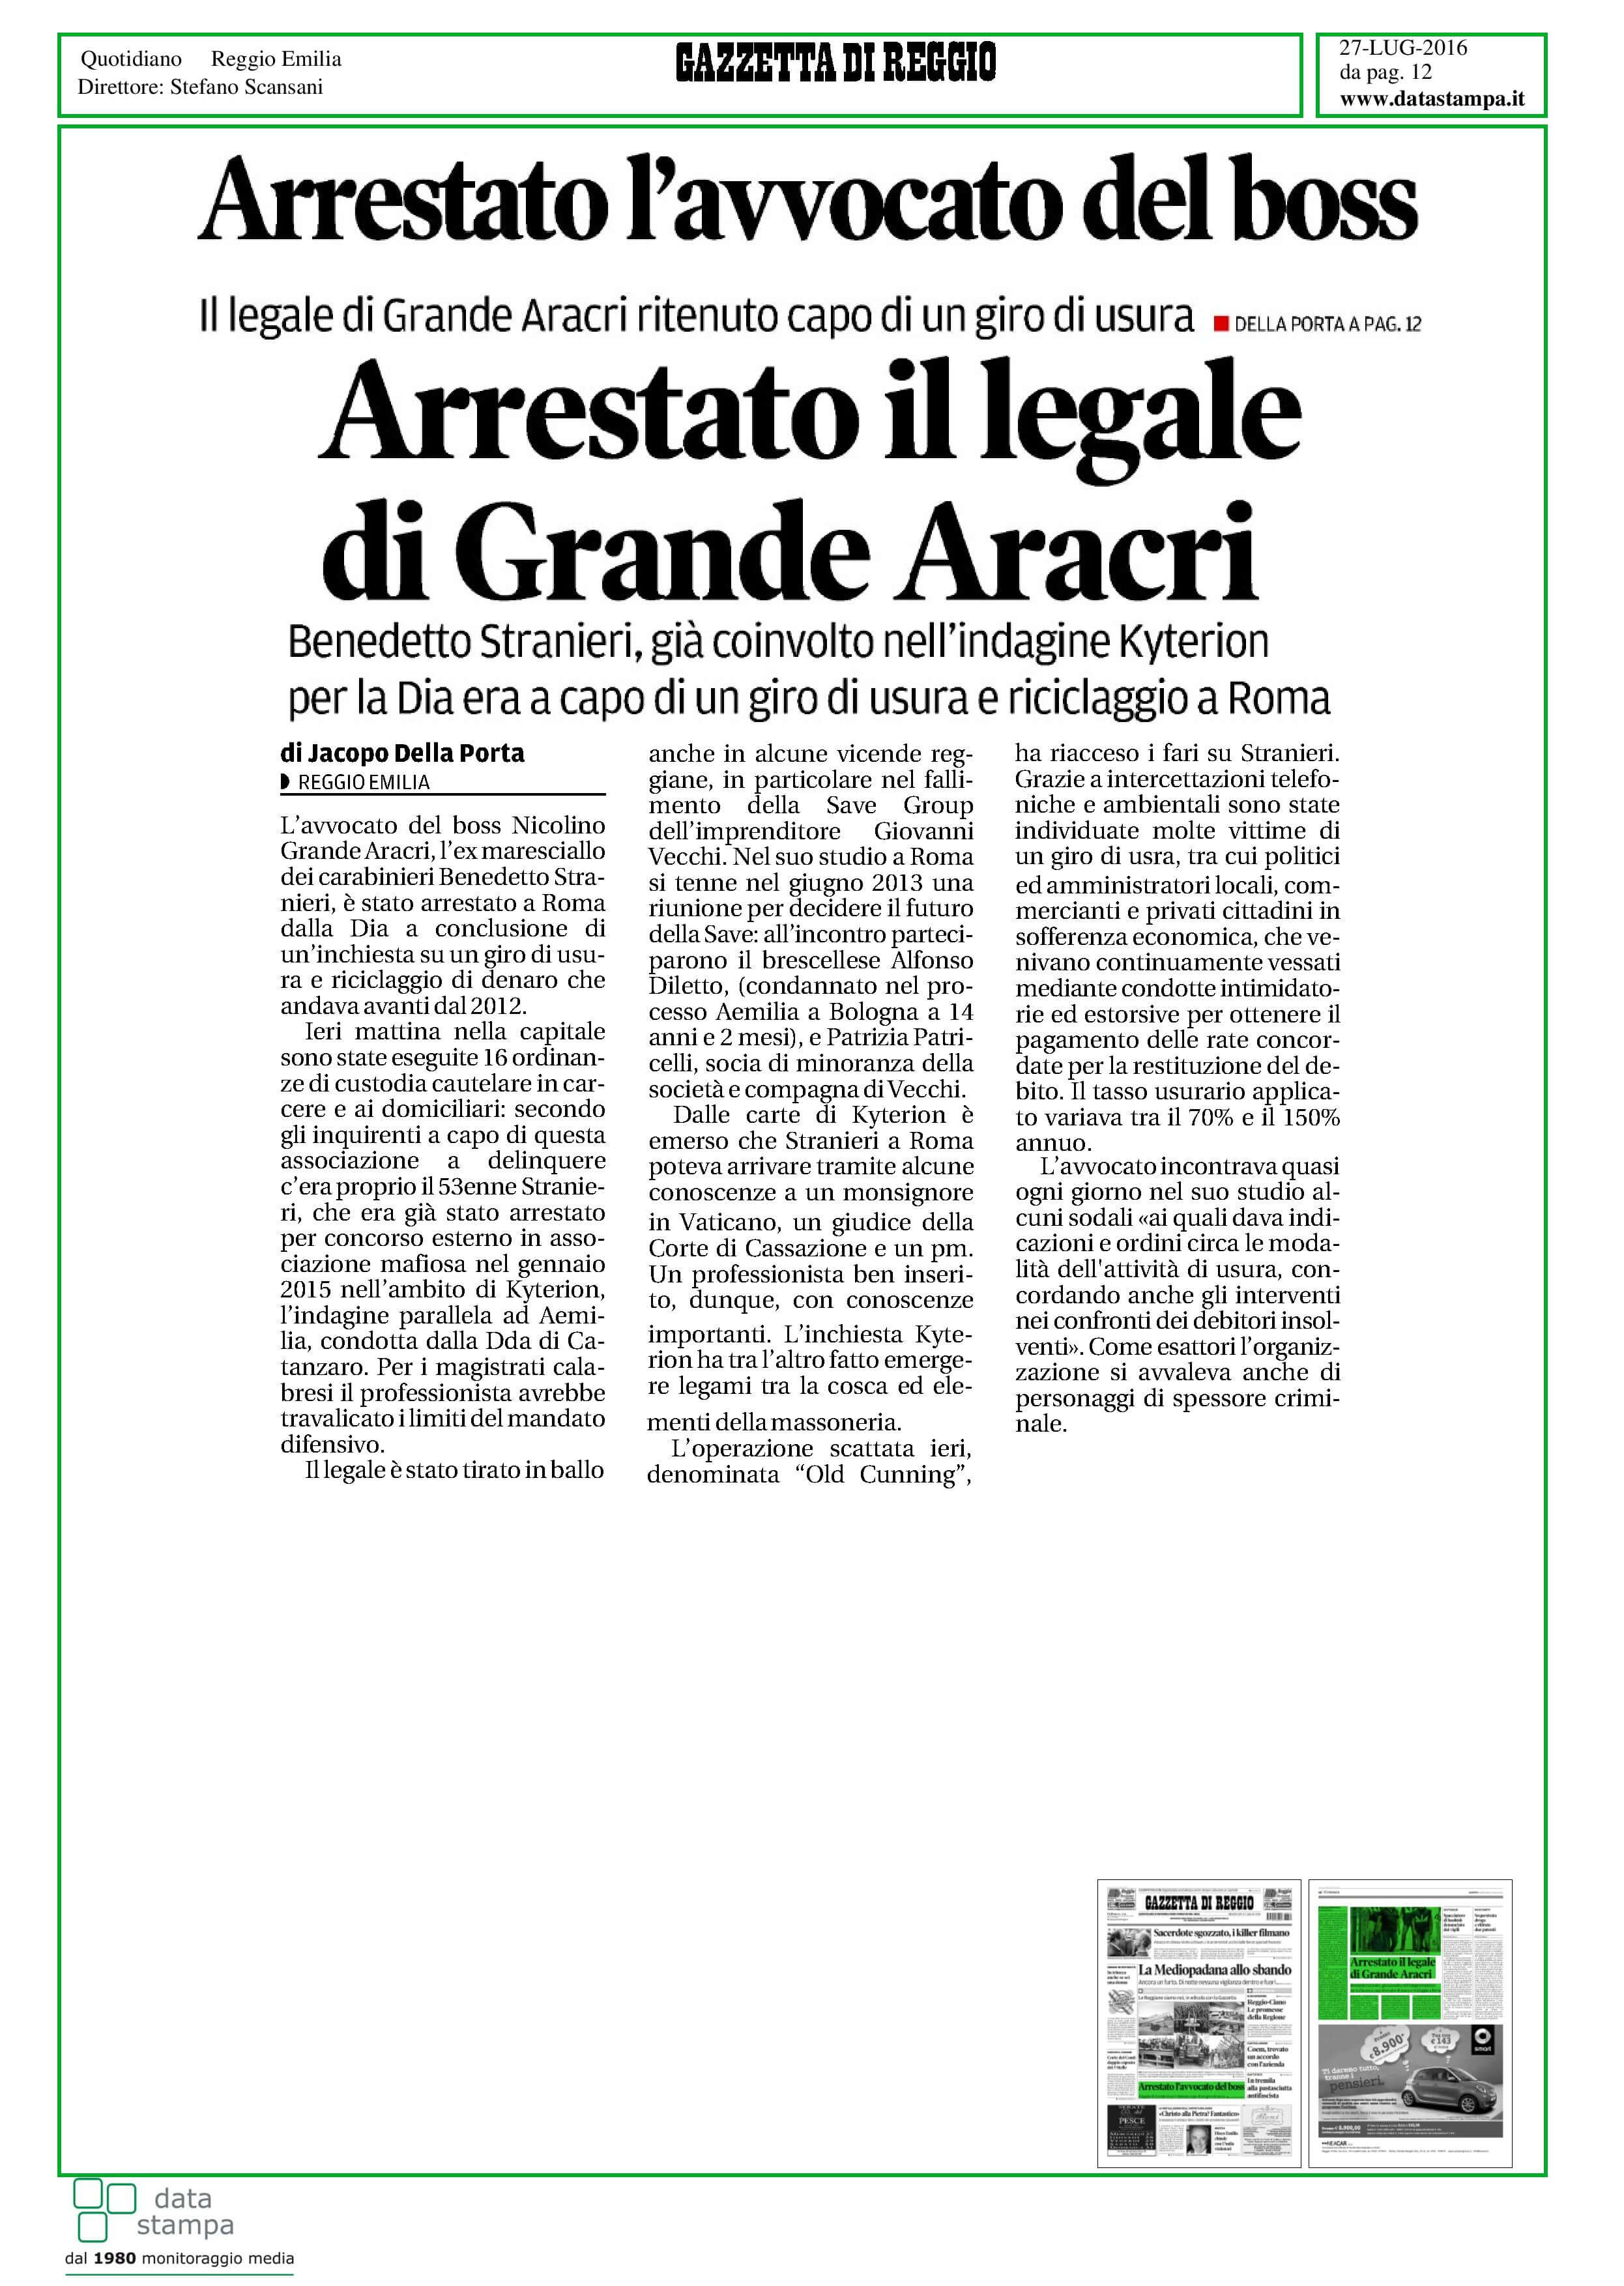 arrestato-avvocato-boss-page-001